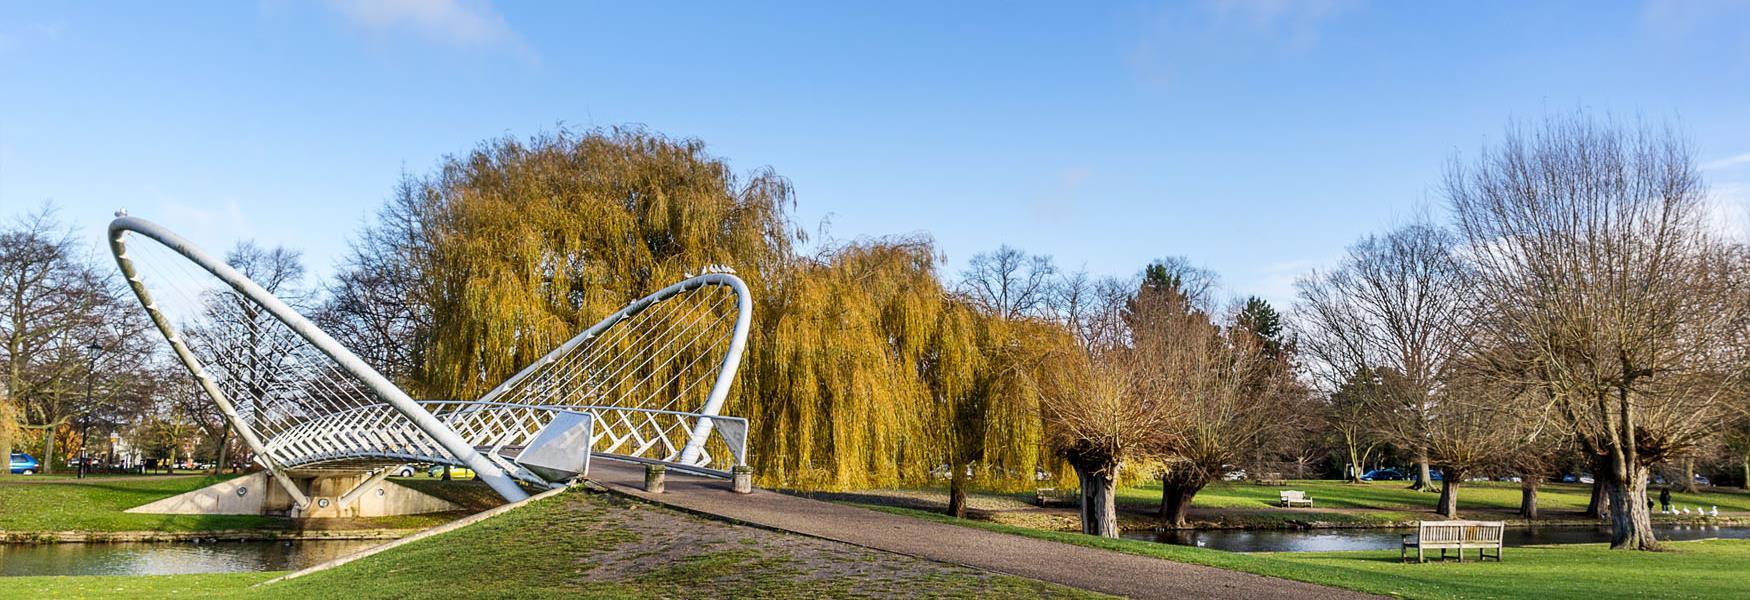 River Oust, Bedfordshire